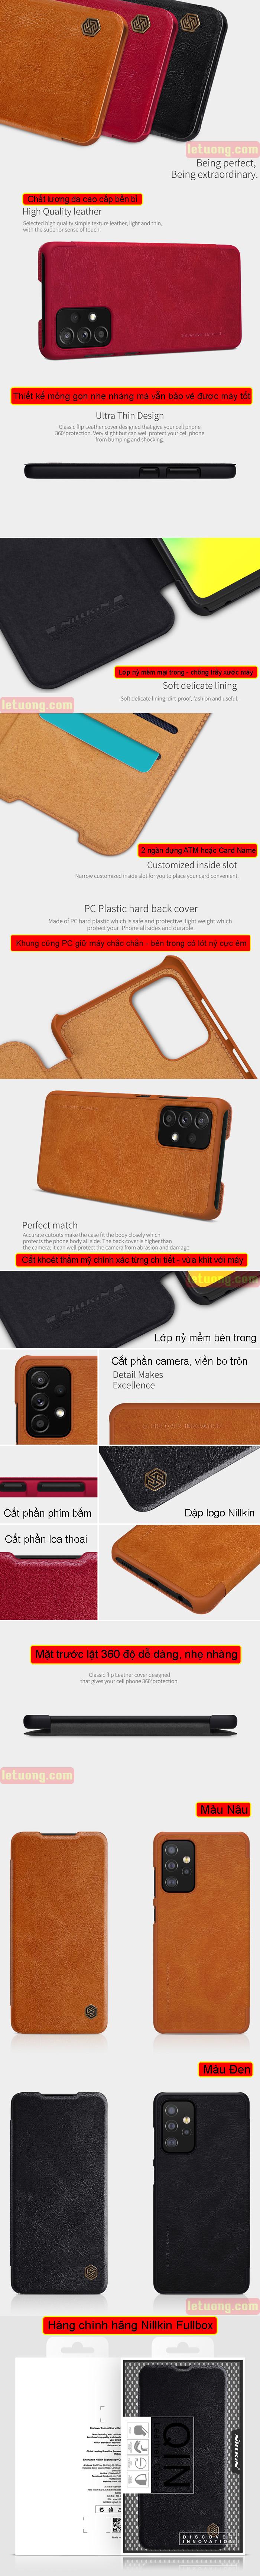 Bao da Samsung Galaxy A52, A52 5G Nillkin Qin Leather vân gỗ - cổ điển 2